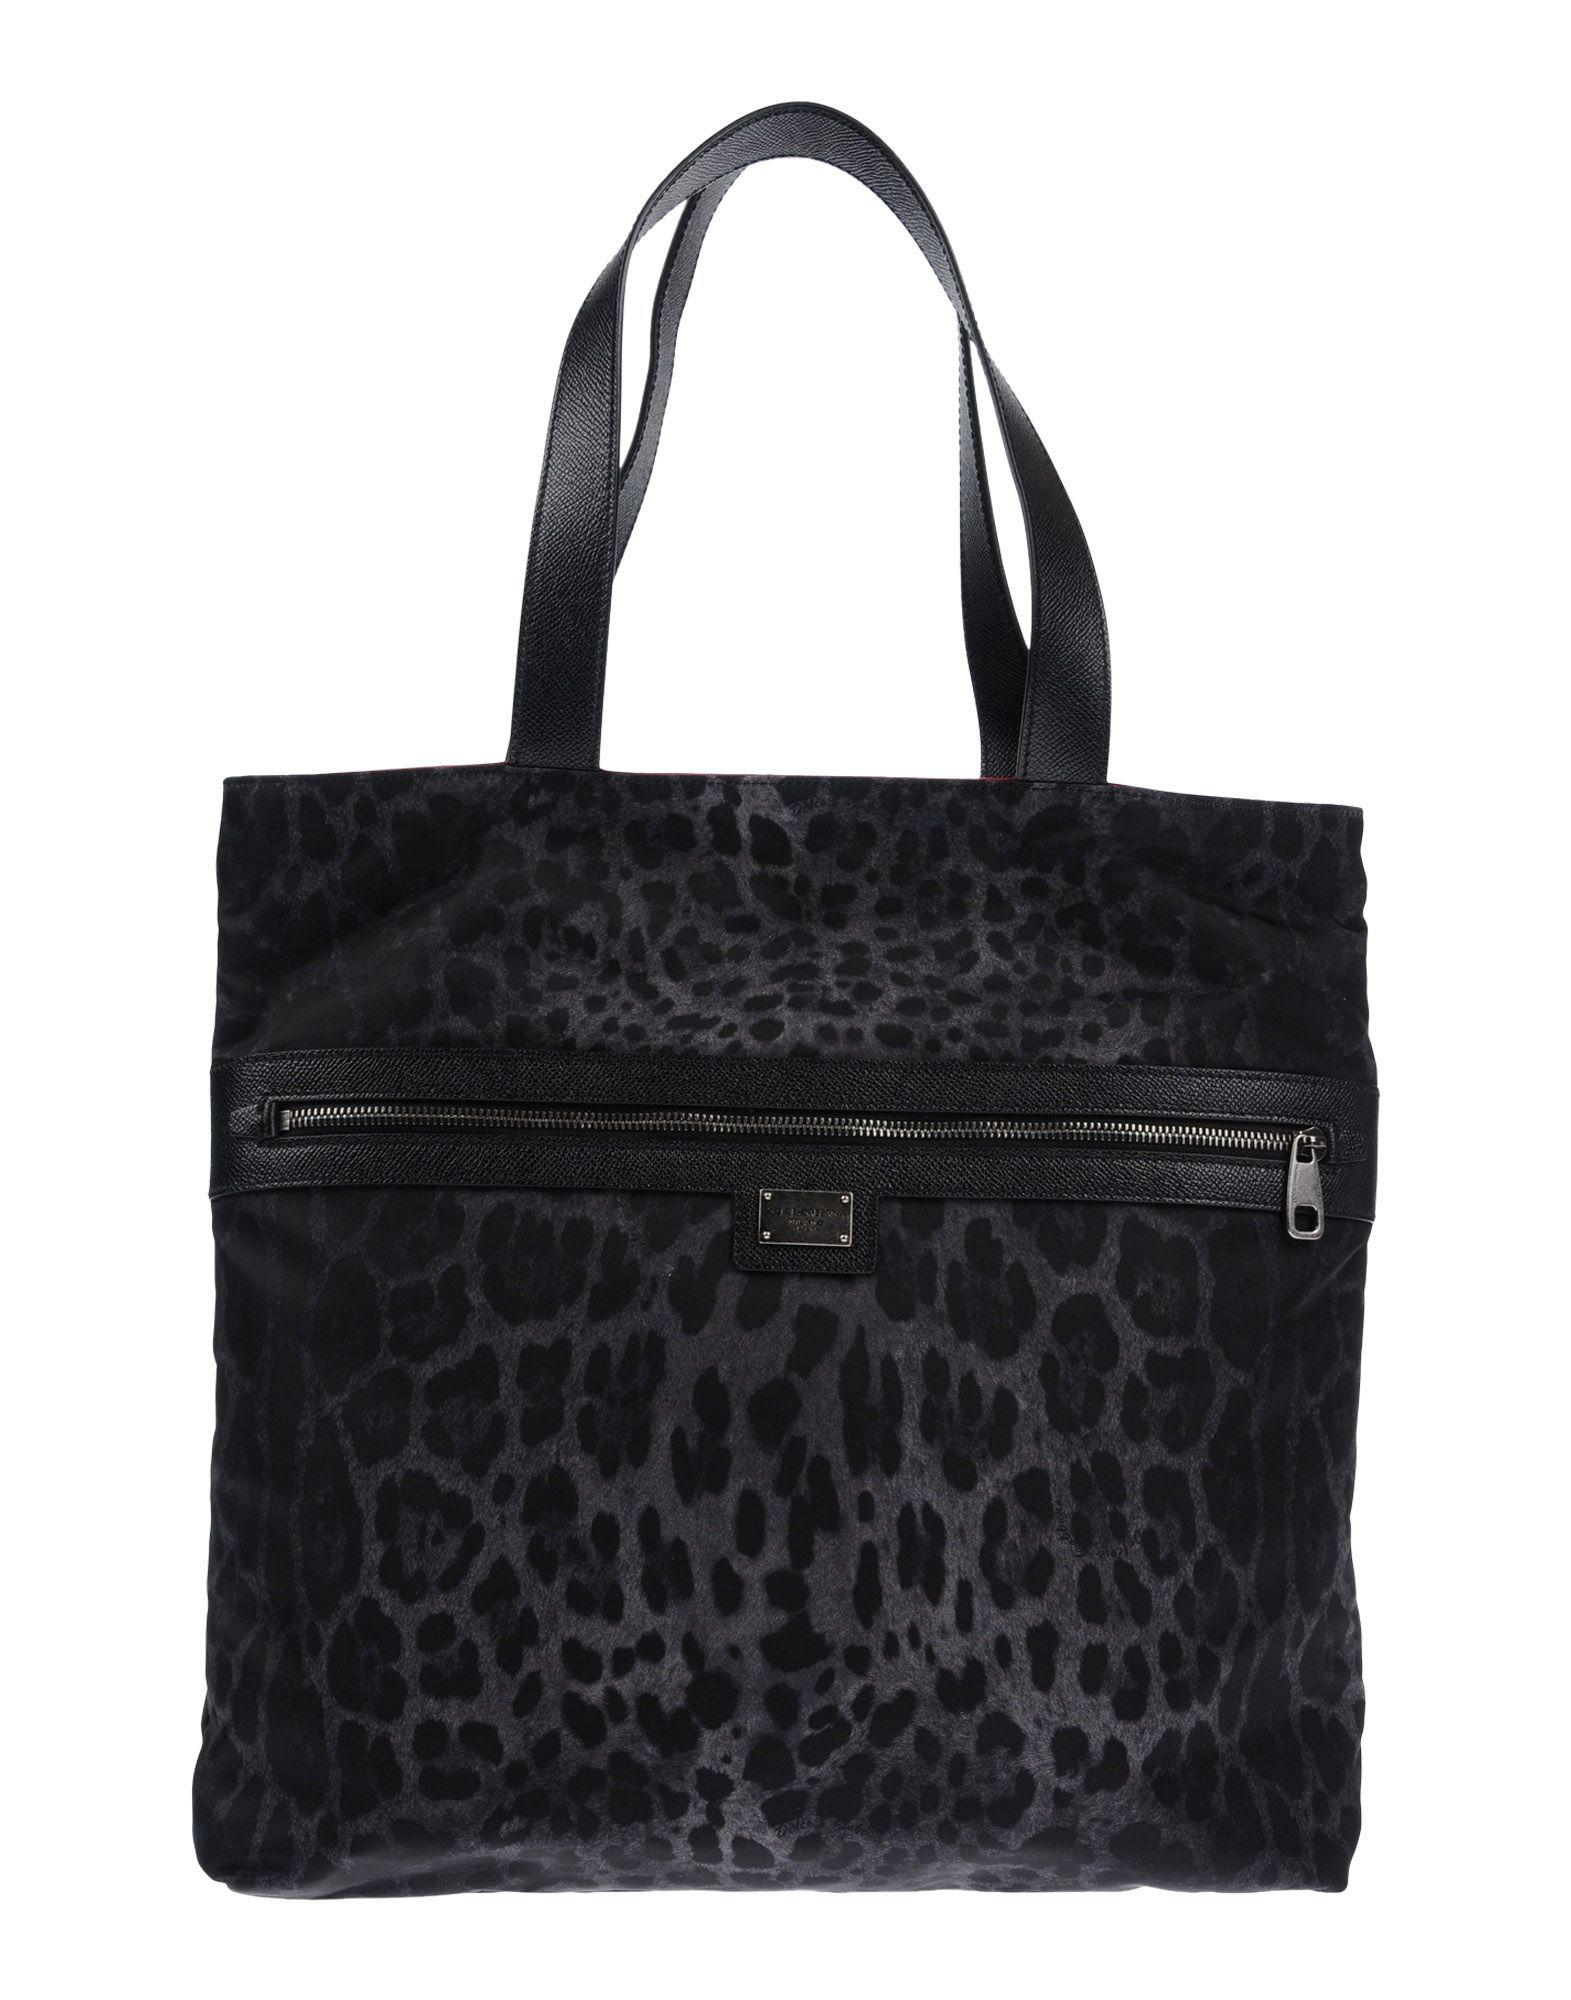 390901835760 Dolce   Gabbana Handbag in Black - Lyst